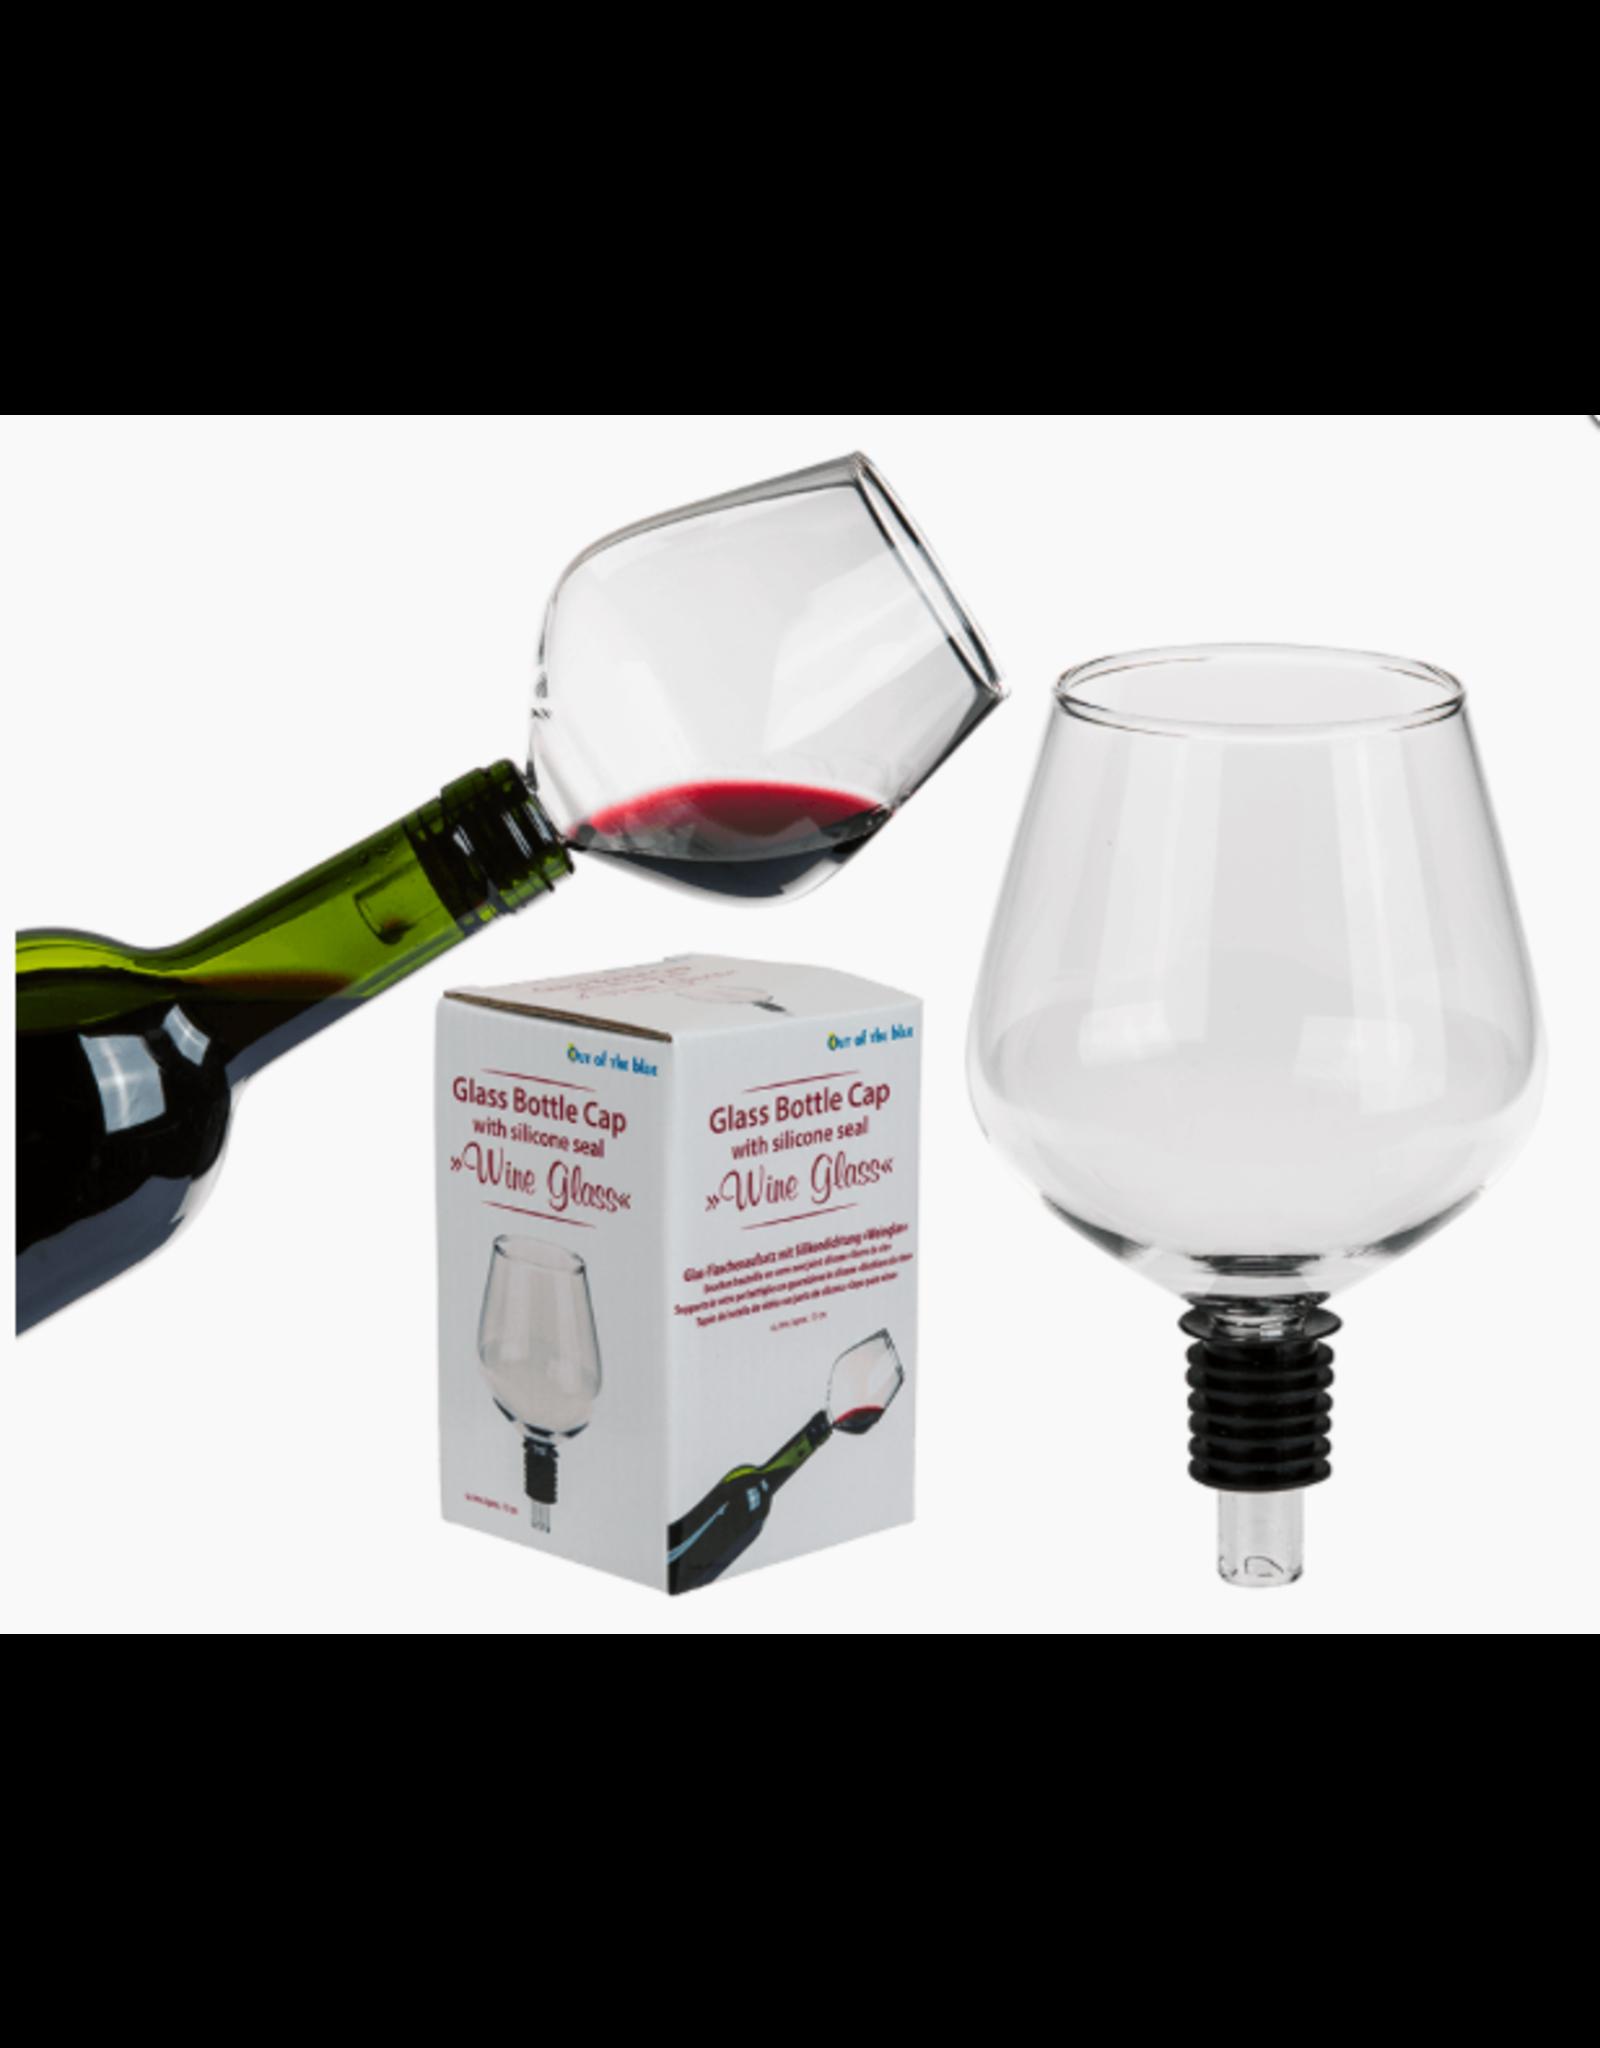 decanter - wine glass bottle cap